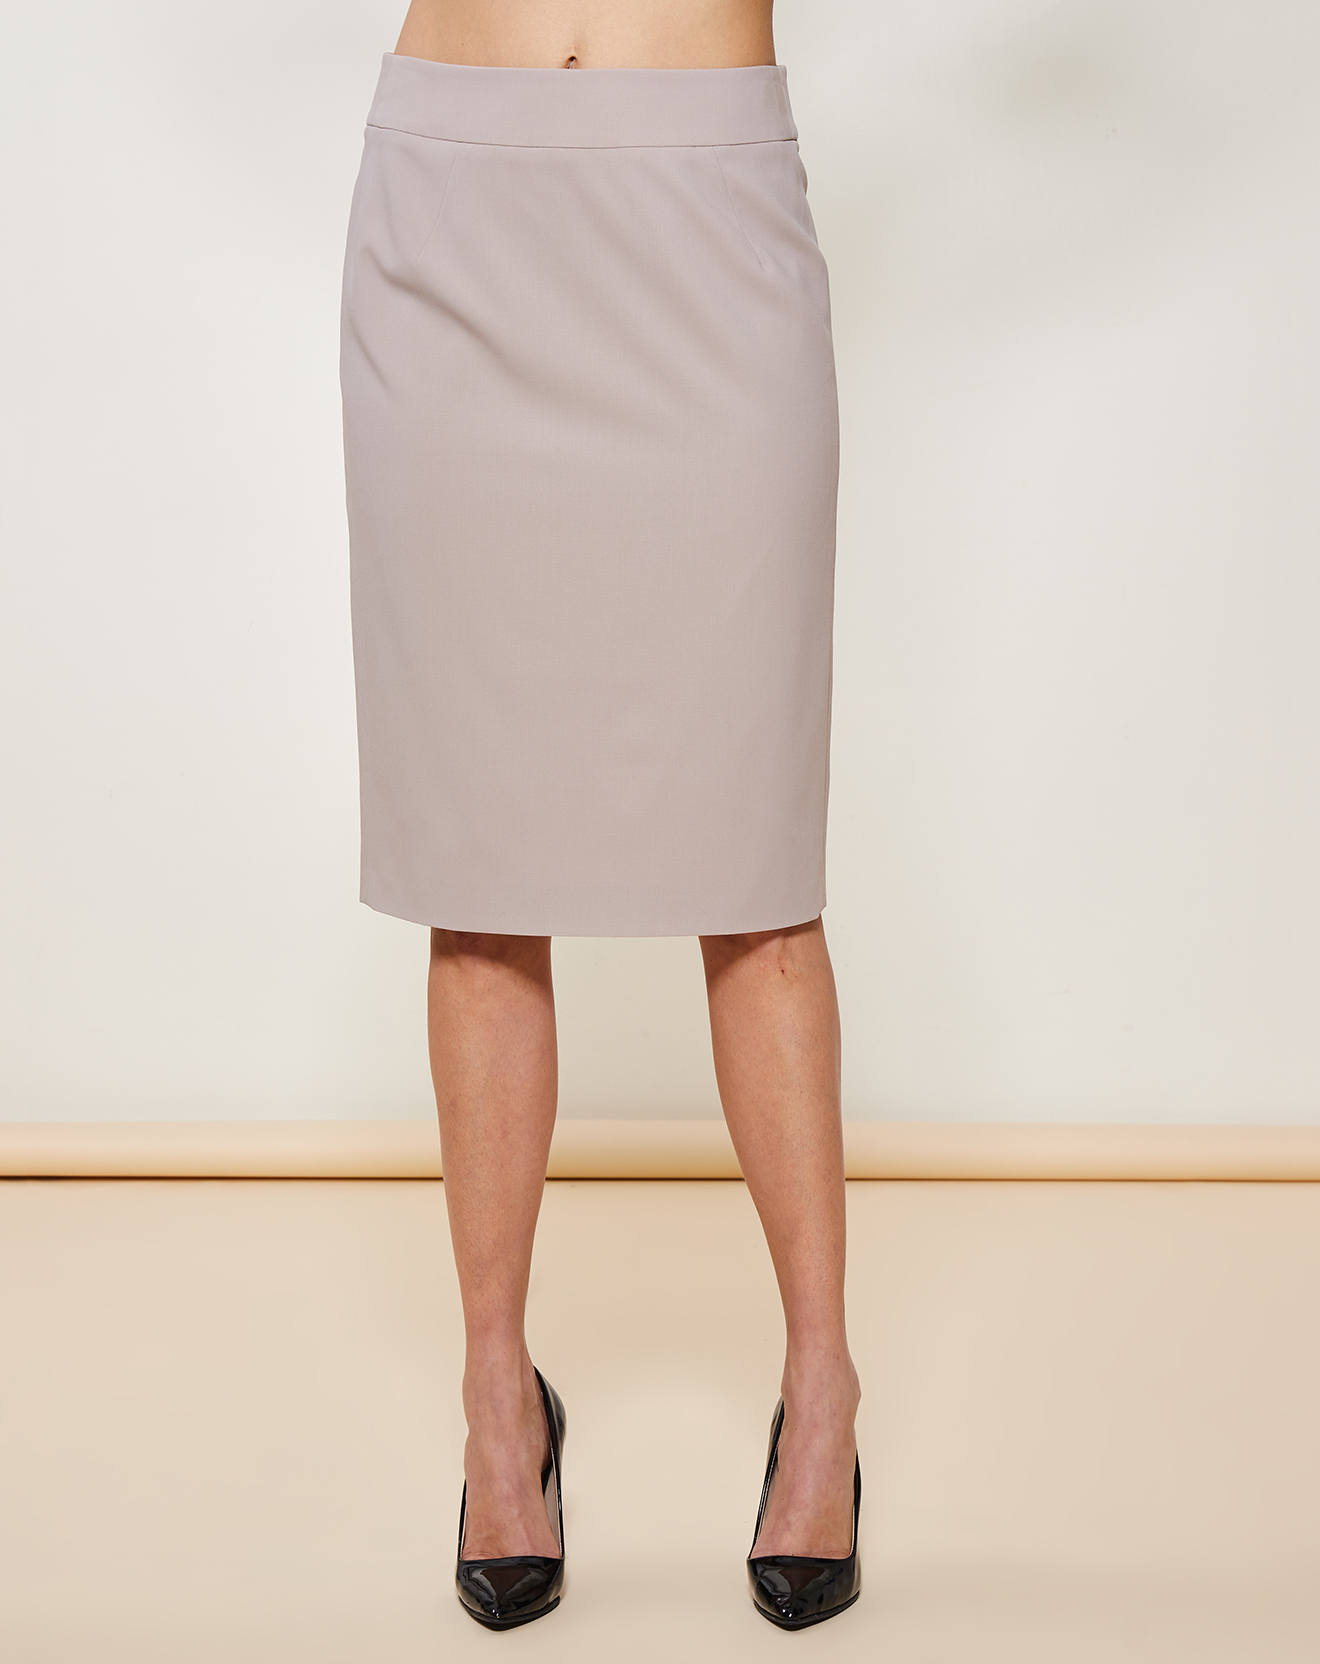 Jupe droite 100% Laine Vierge unie - Giorgio Armani - Modalova